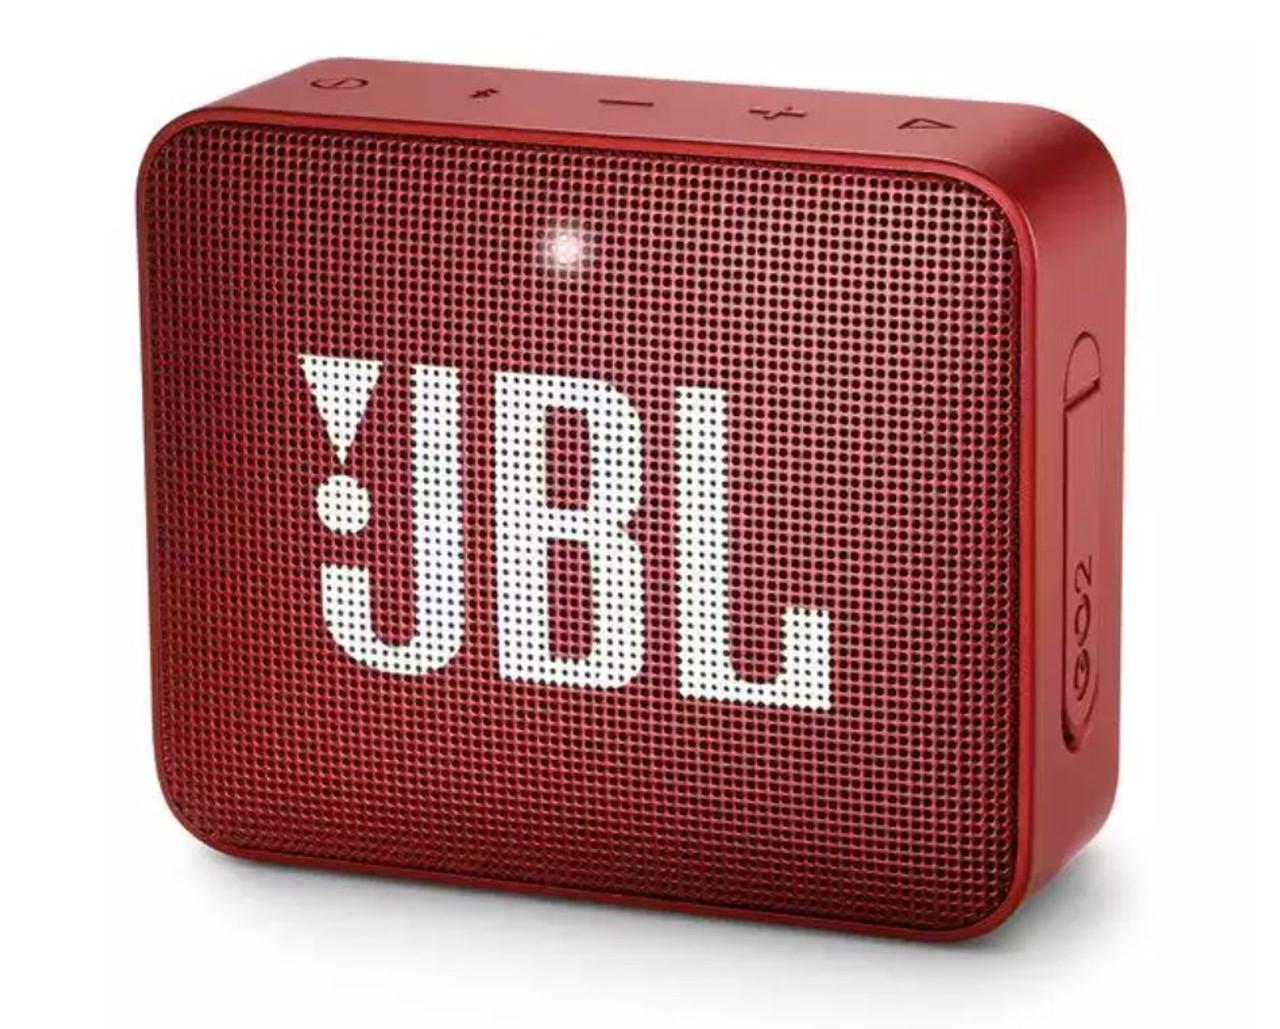 JBL JBLGO2RED-Z  Go 2 Portable Bluetooth Speaker, Ruby Red - Certified Refurbished